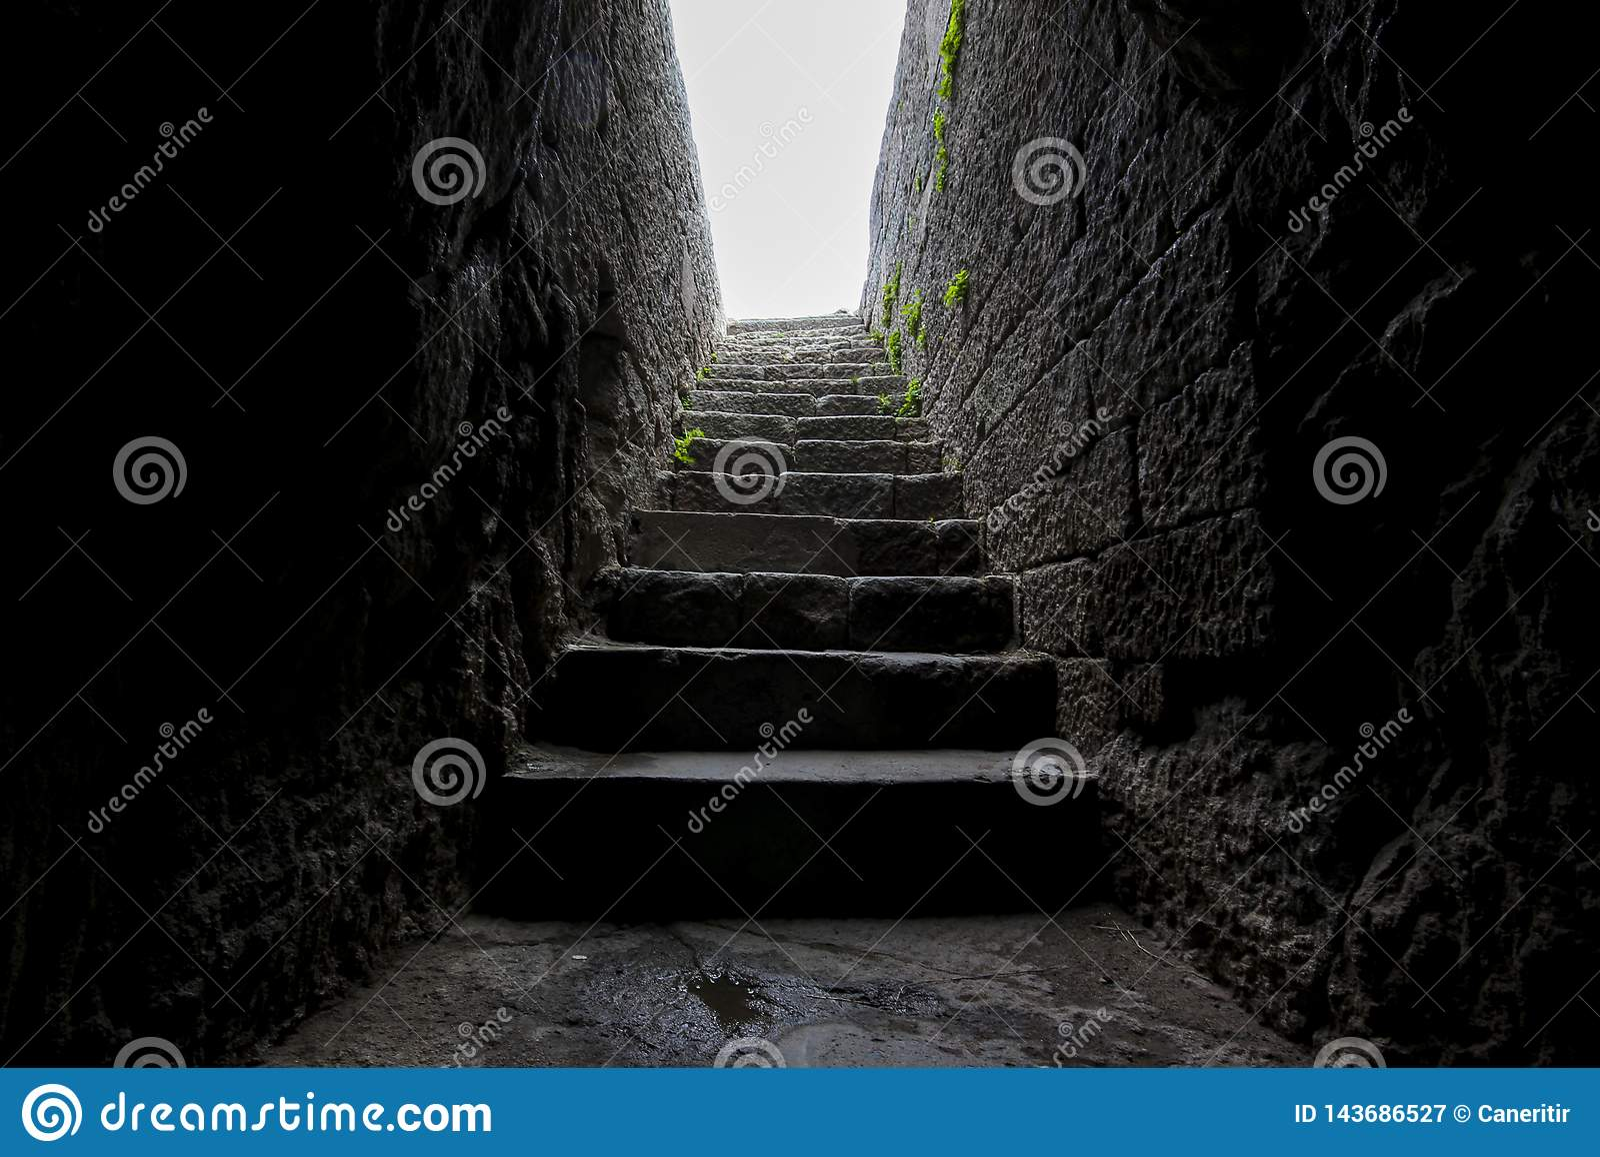 Historical enterance stone slab stairs